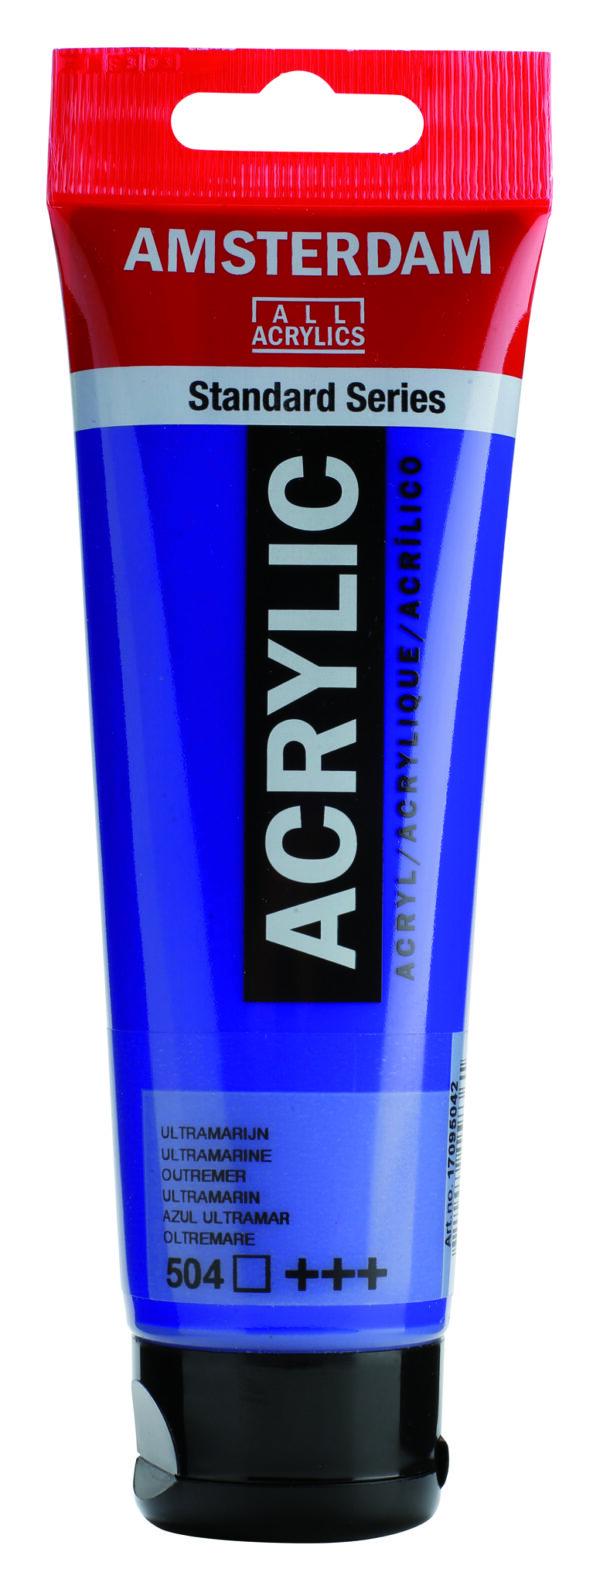 Ams std 504 Ultramarine - 120 ml